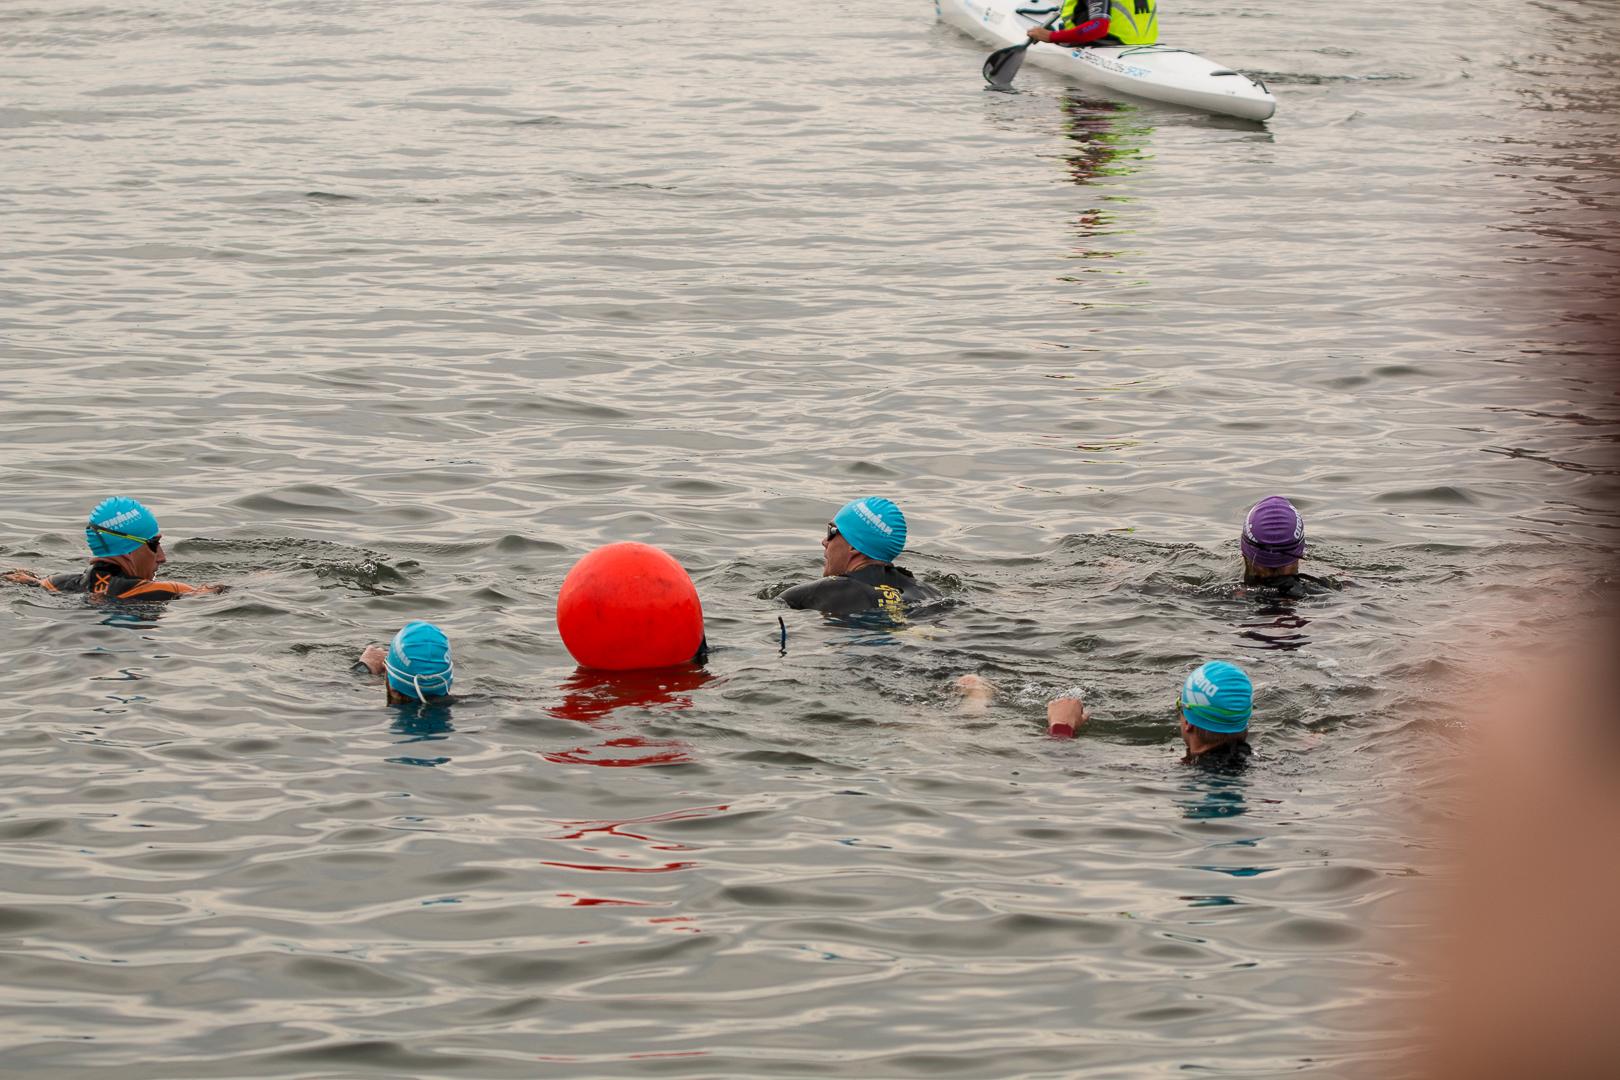 Vid starten på en Ironman-simning. Foto: Erik Arenhill